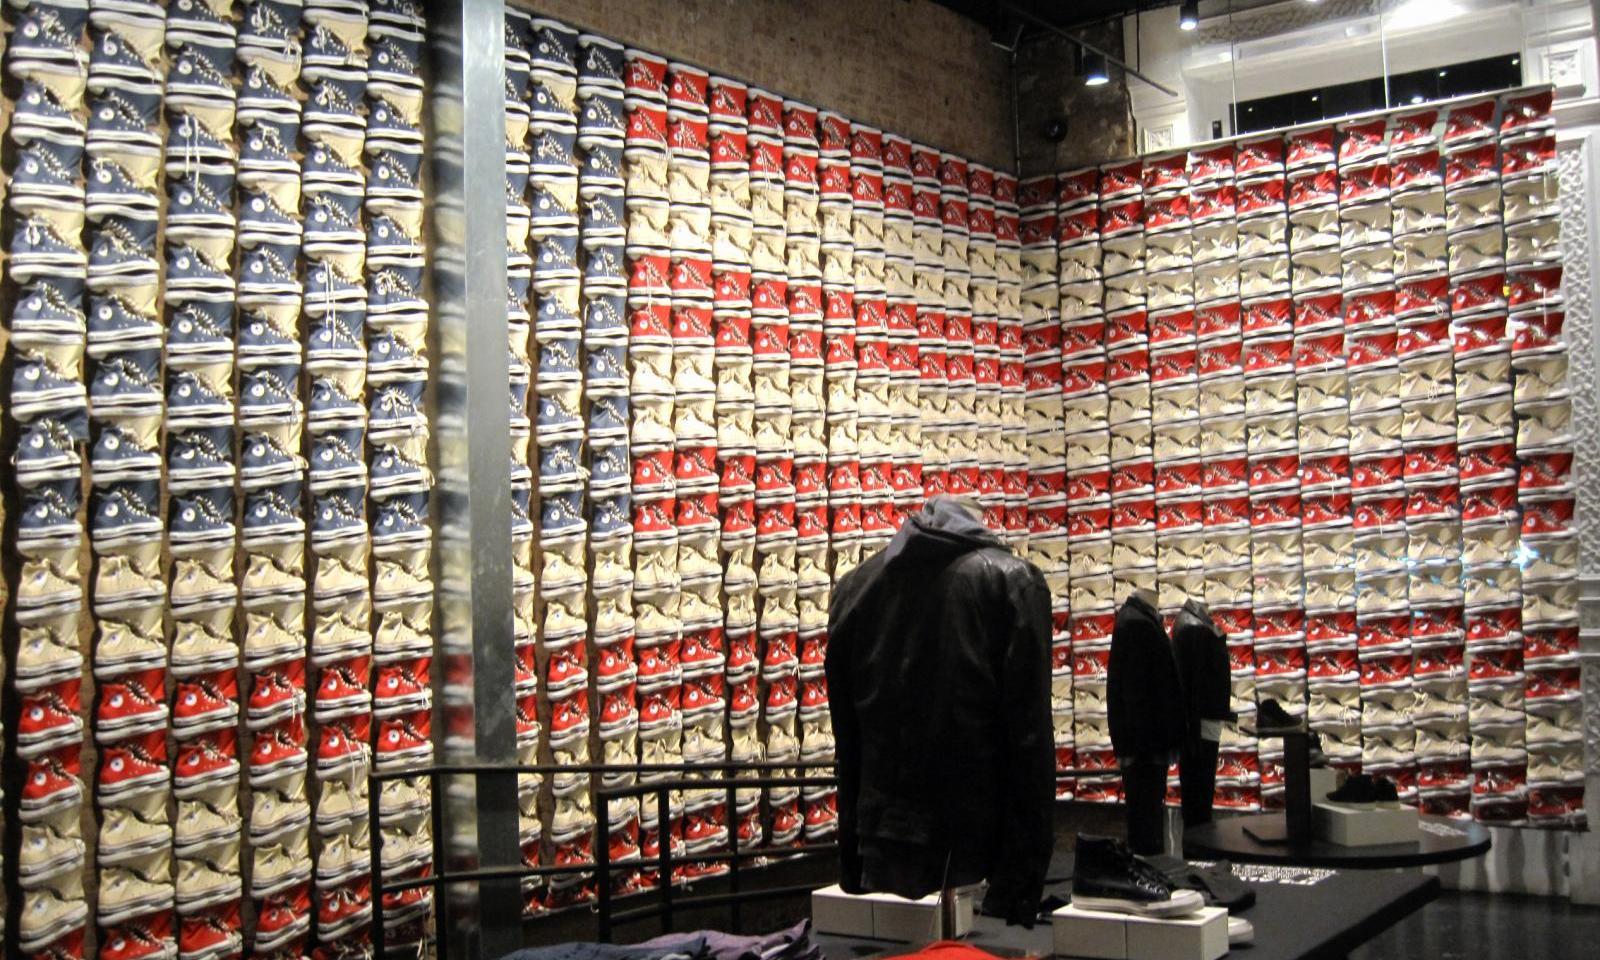 Fan Tipp: Verpasst nicht diesen tollen Converse Store in Soho